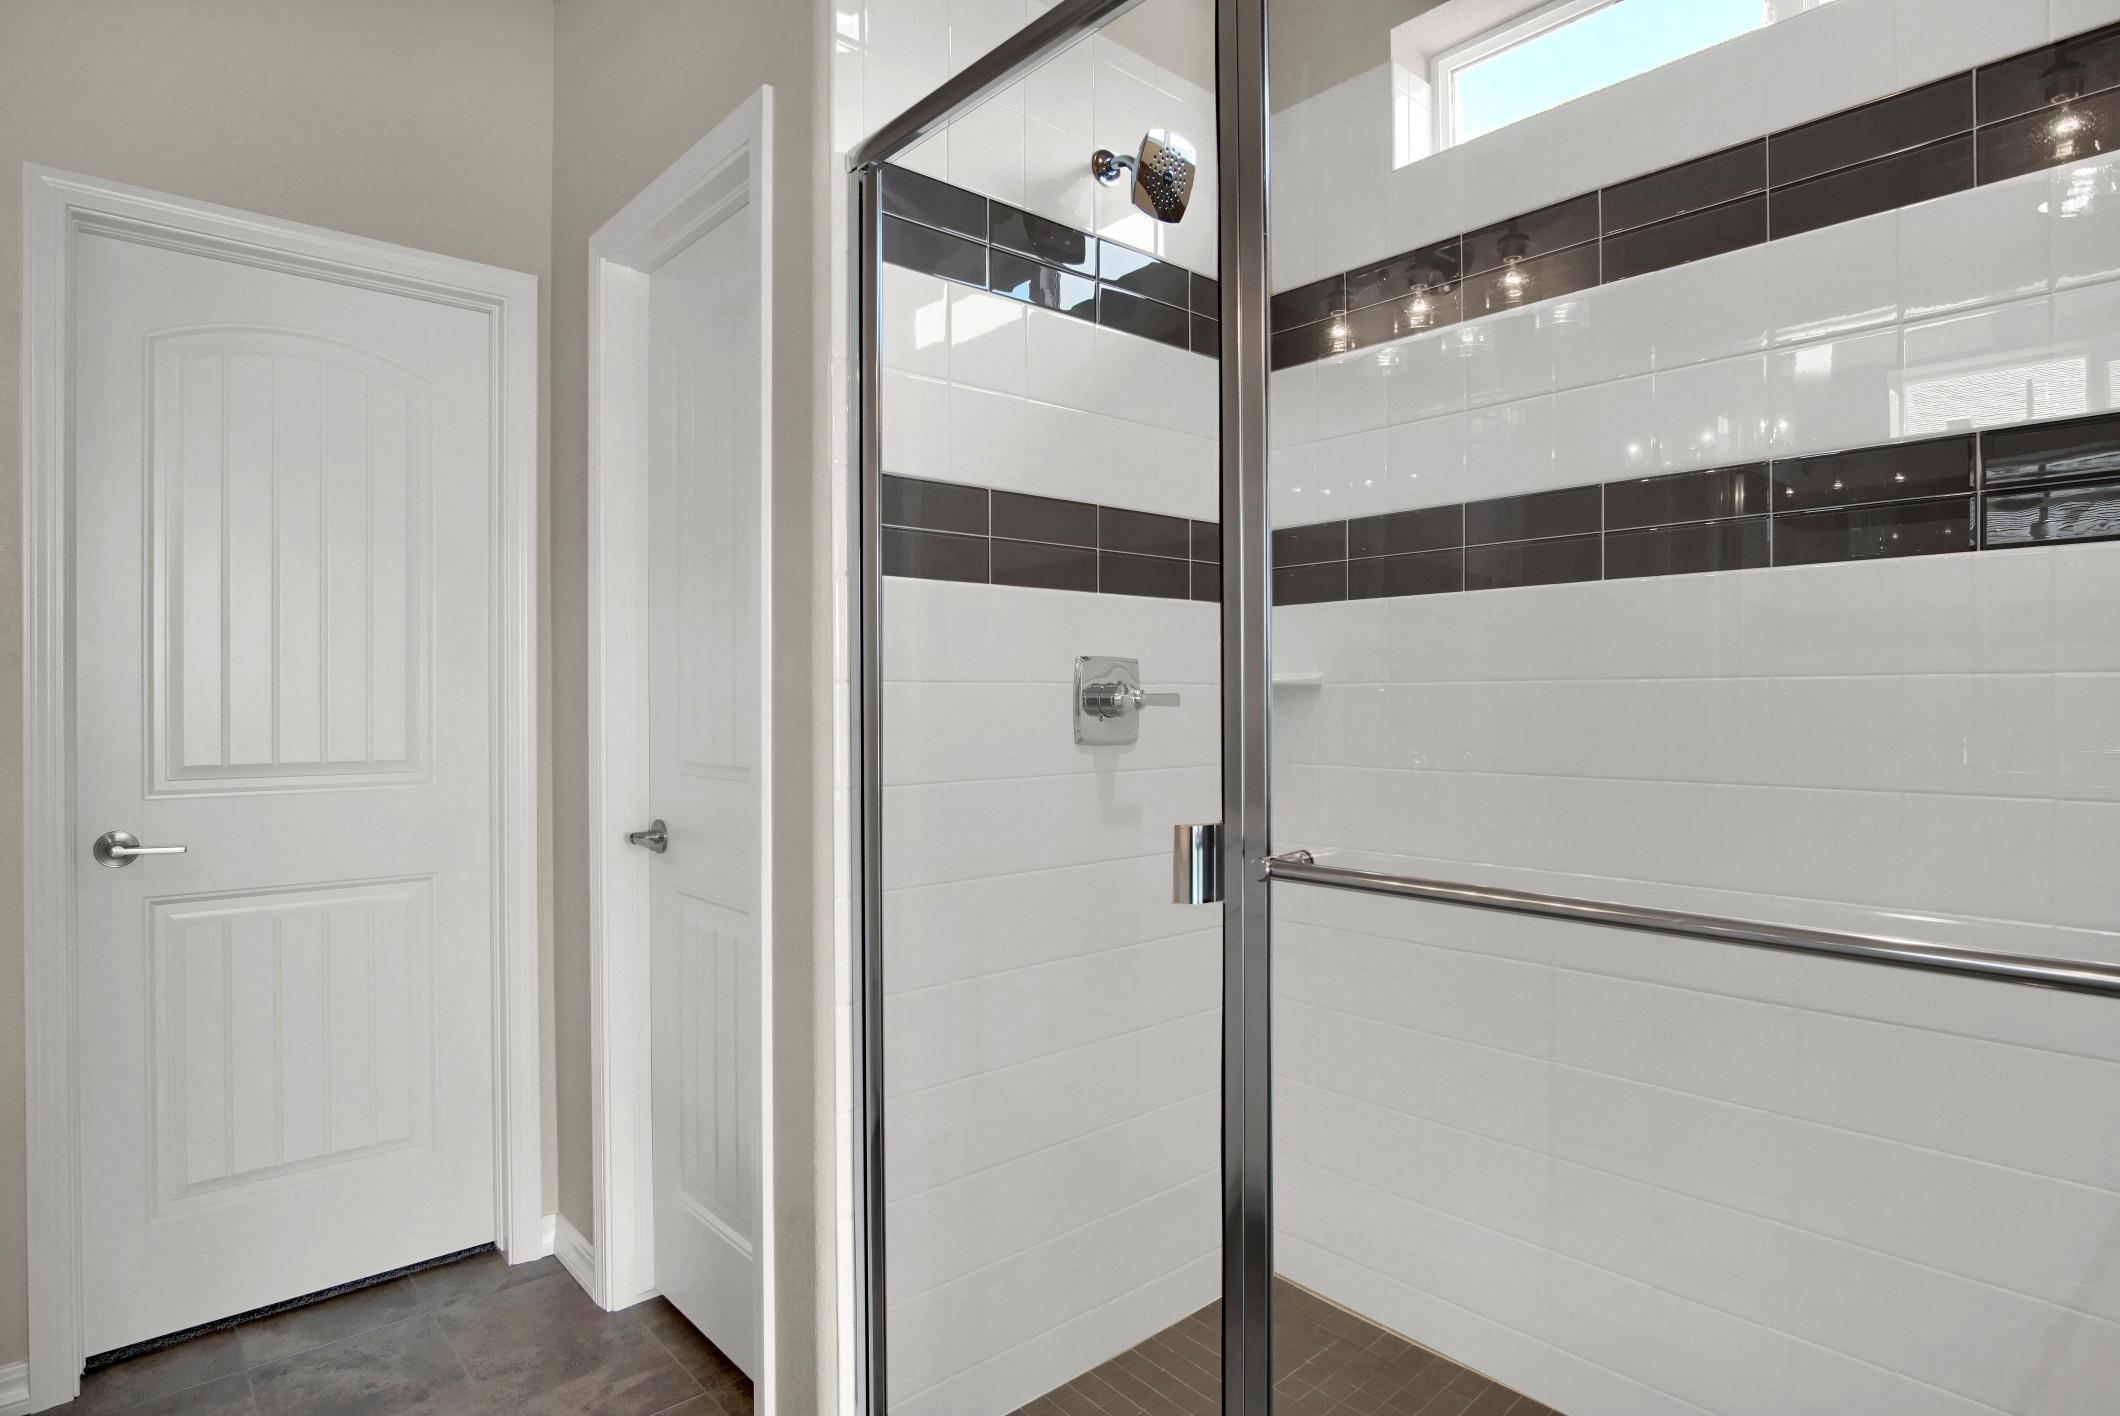 Bathroom featured in the Telluride By Keller Homes in Colorado Springs, CO